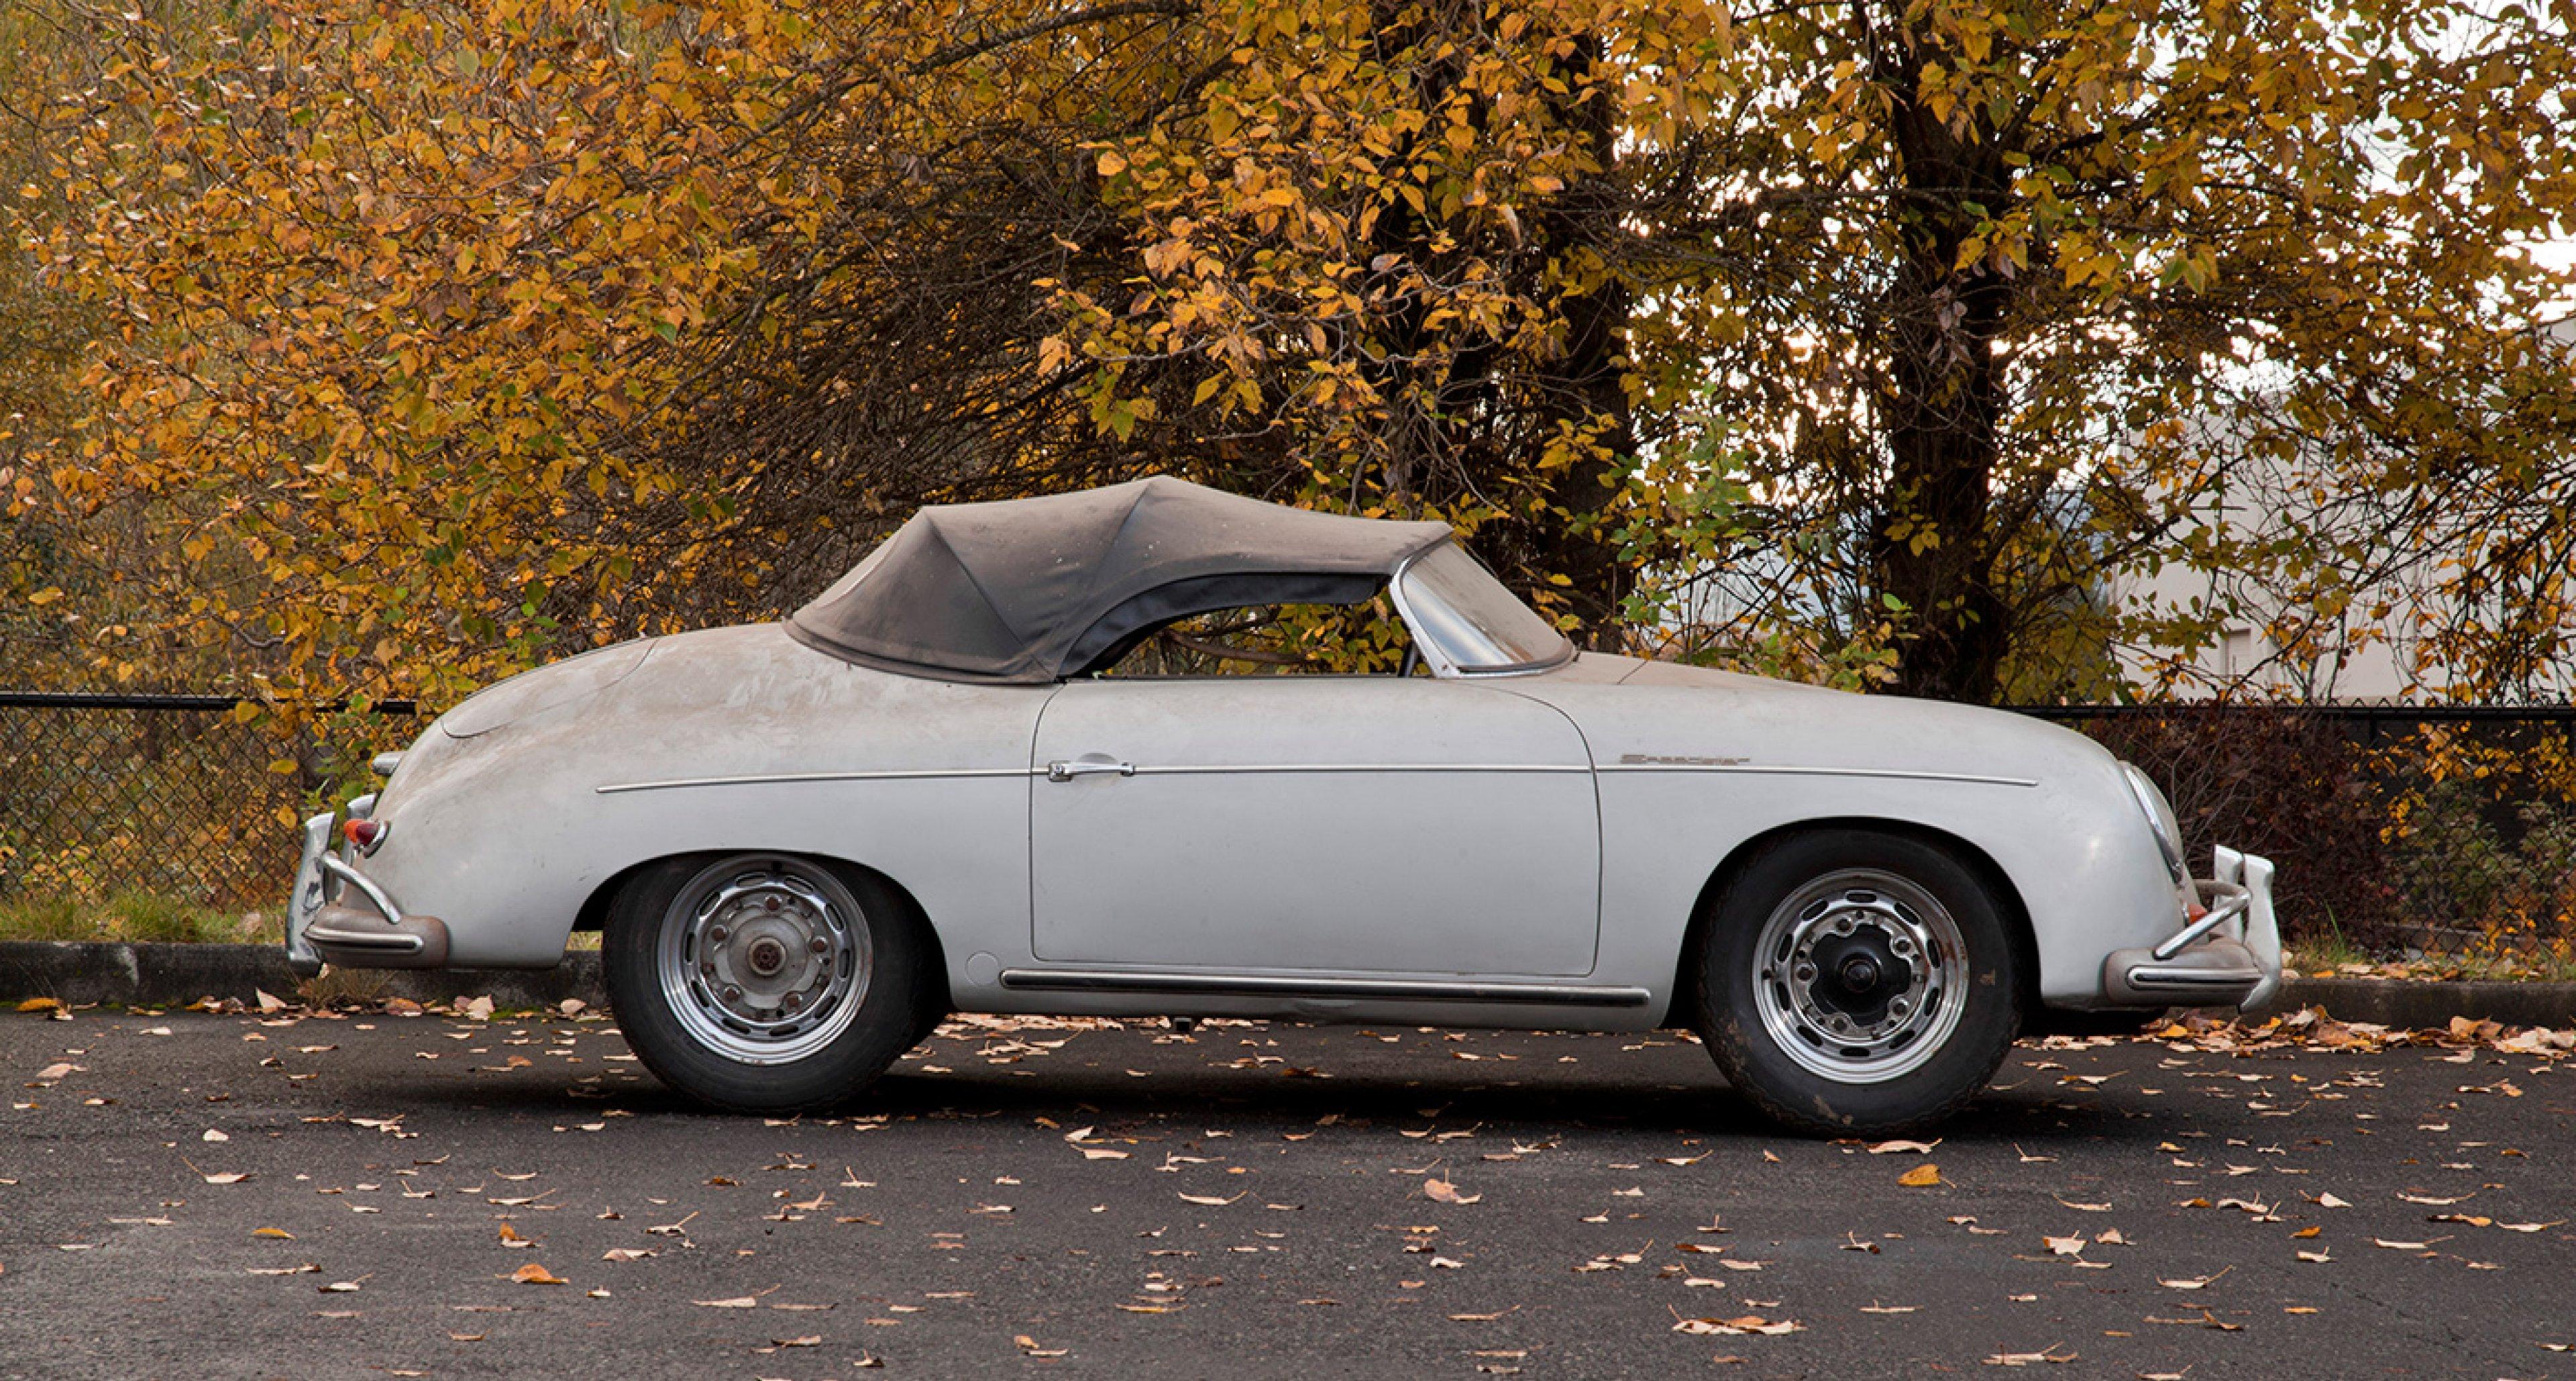 1955 Porsche 356A Speedster sold by Bonhams in 2012 for $100,620